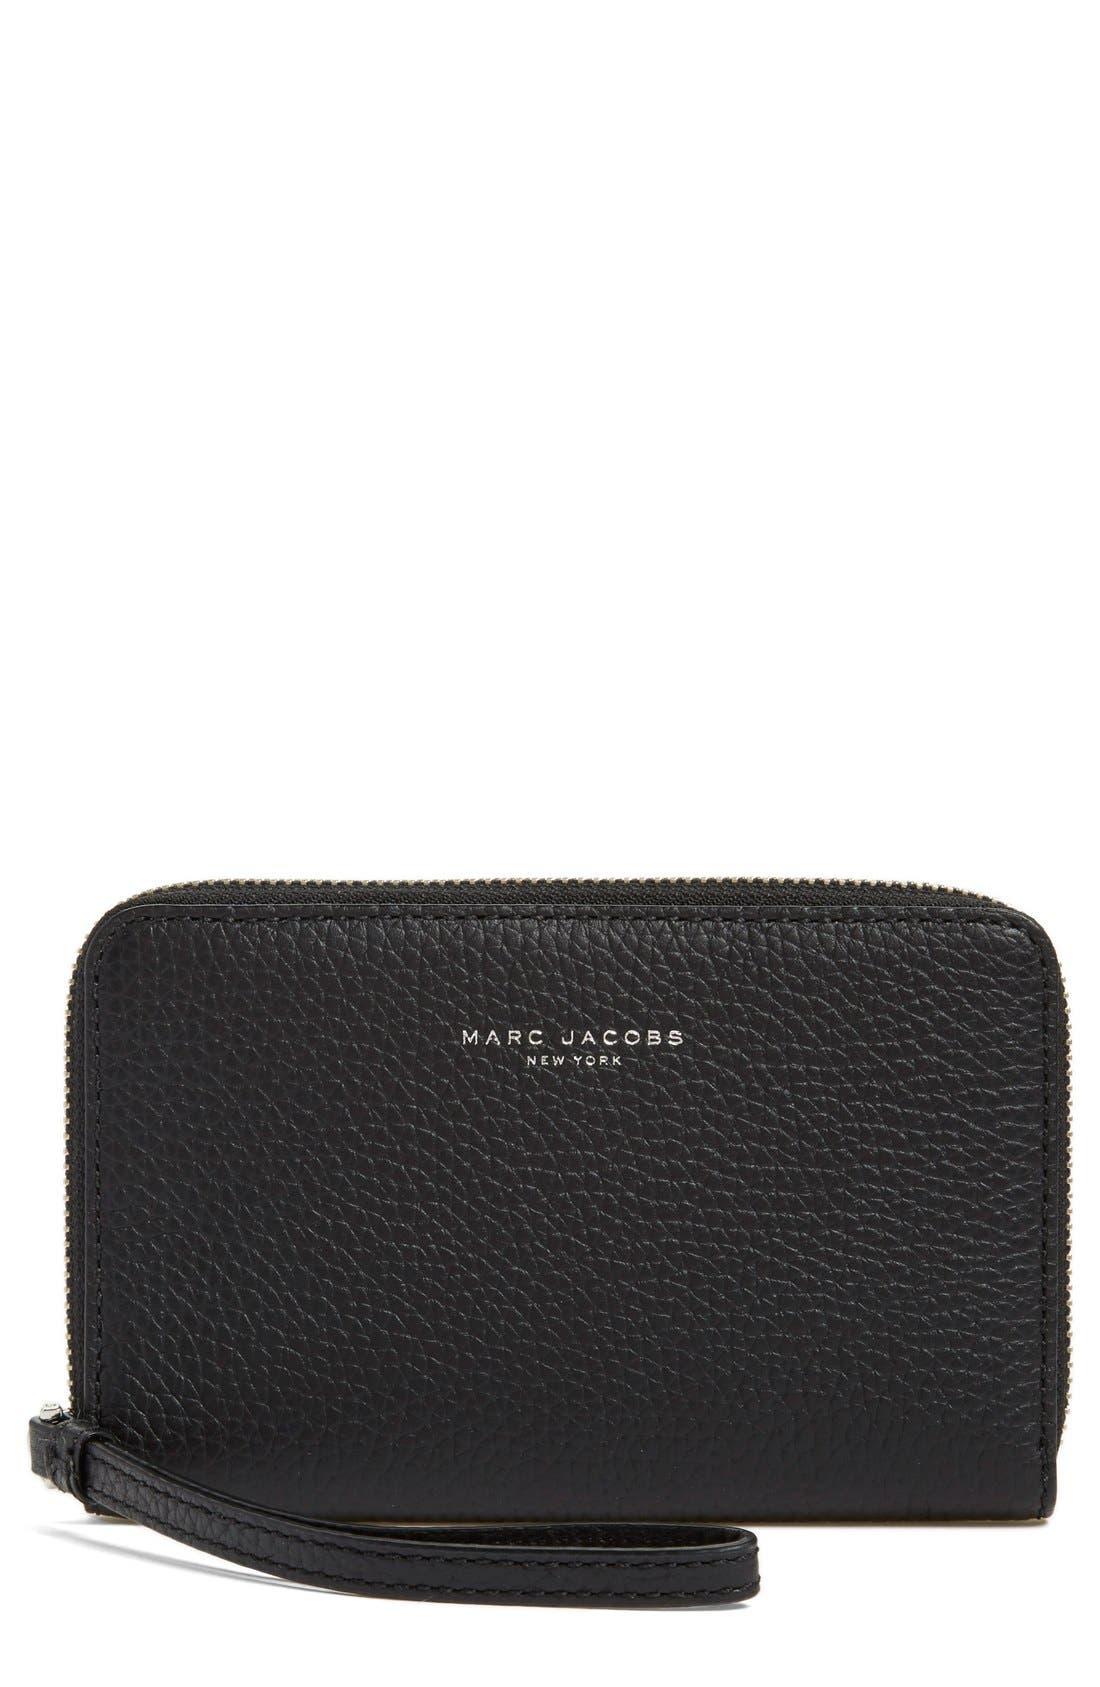 'Pike Place' Leather Zip Phone Wristlet,                             Main thumbnail 1, color,                             001